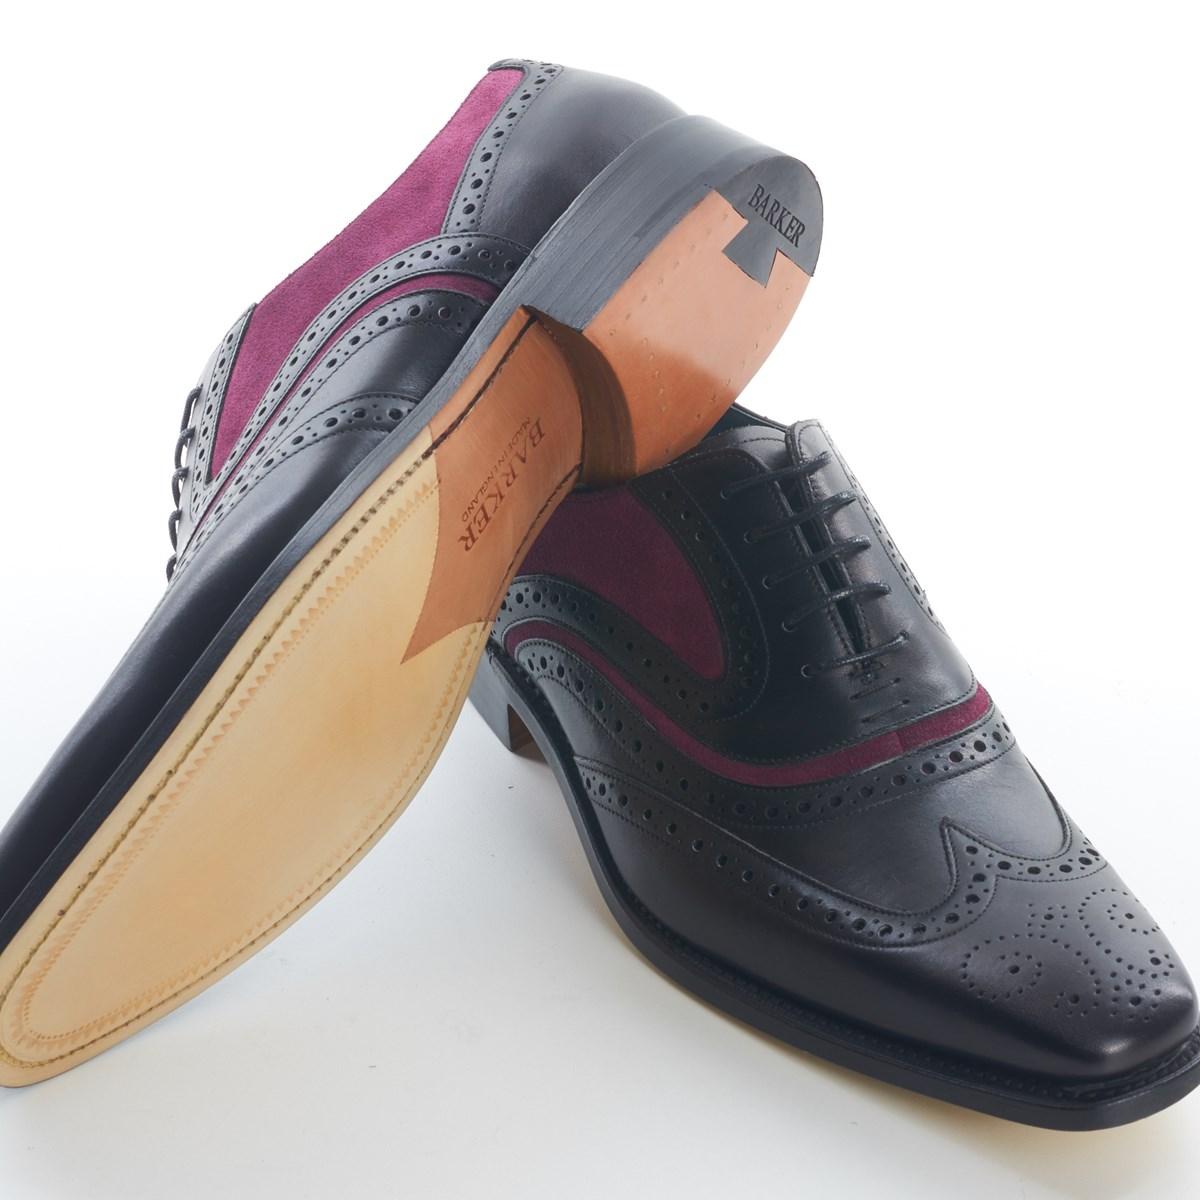 a4fde850eda4e Dress Brogue Wingtip McClean Black Calf and Purple by Barker - The Kilt  Store